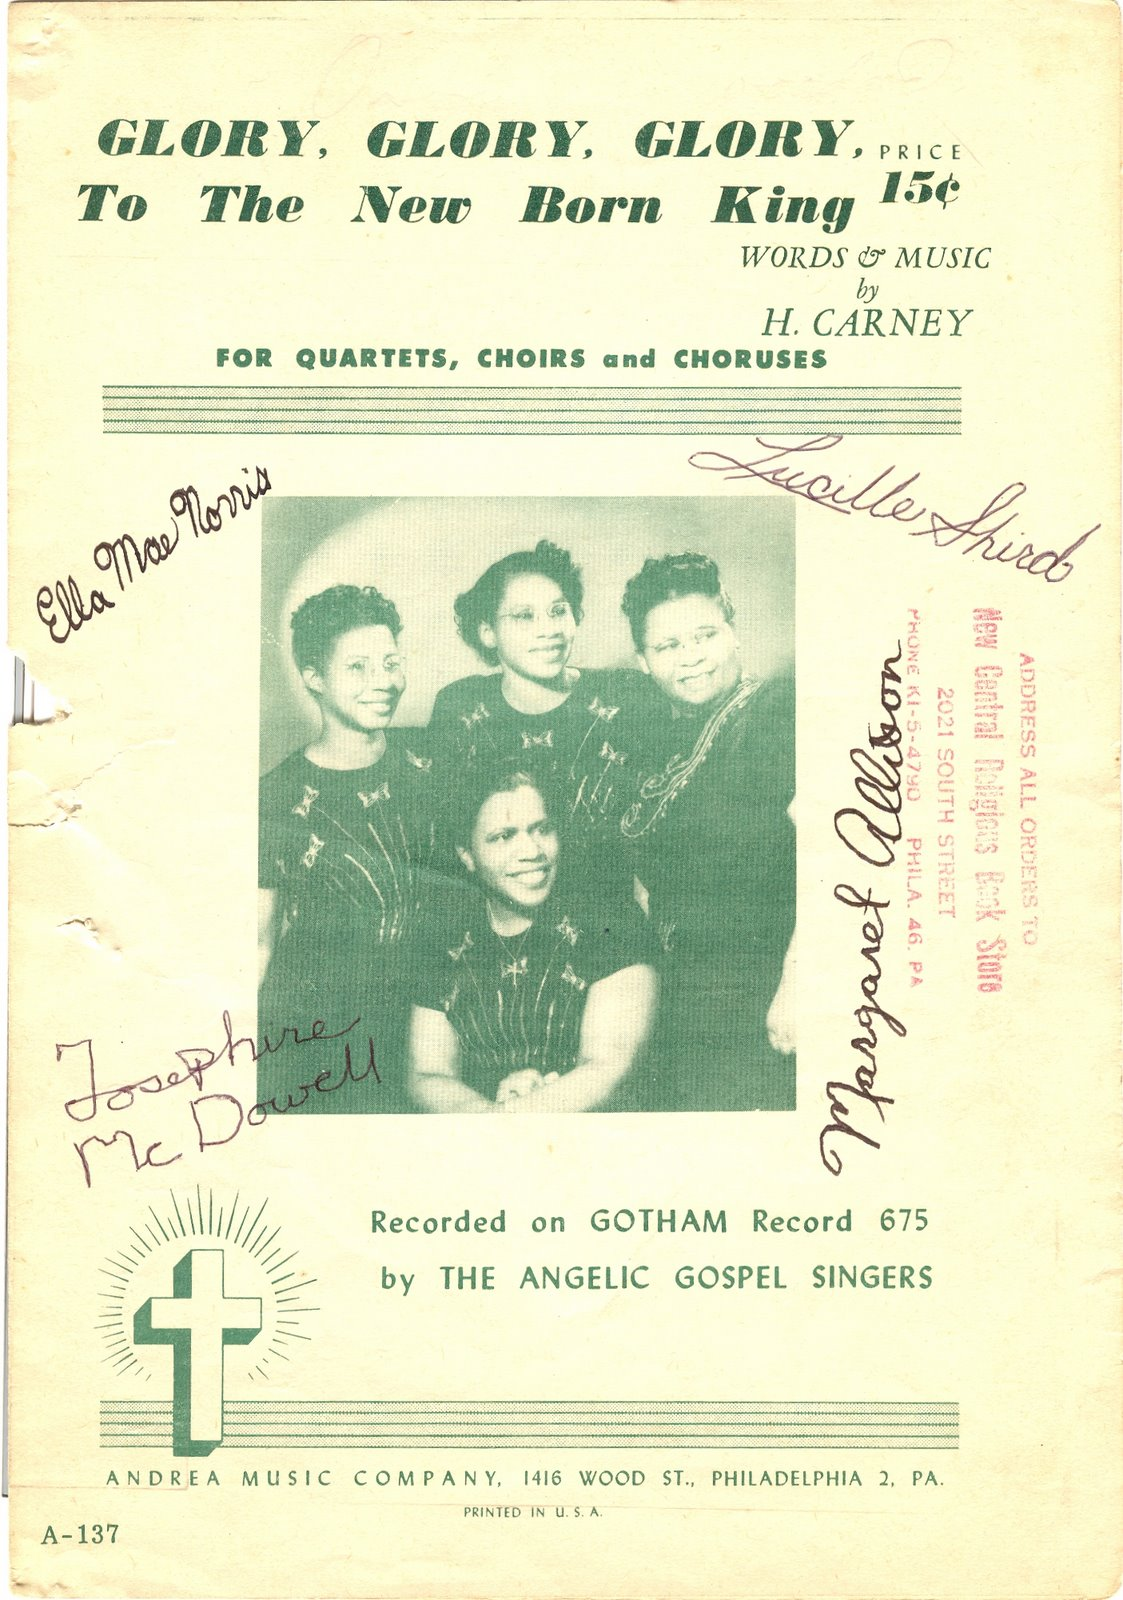 gospel music – A Lifes Work